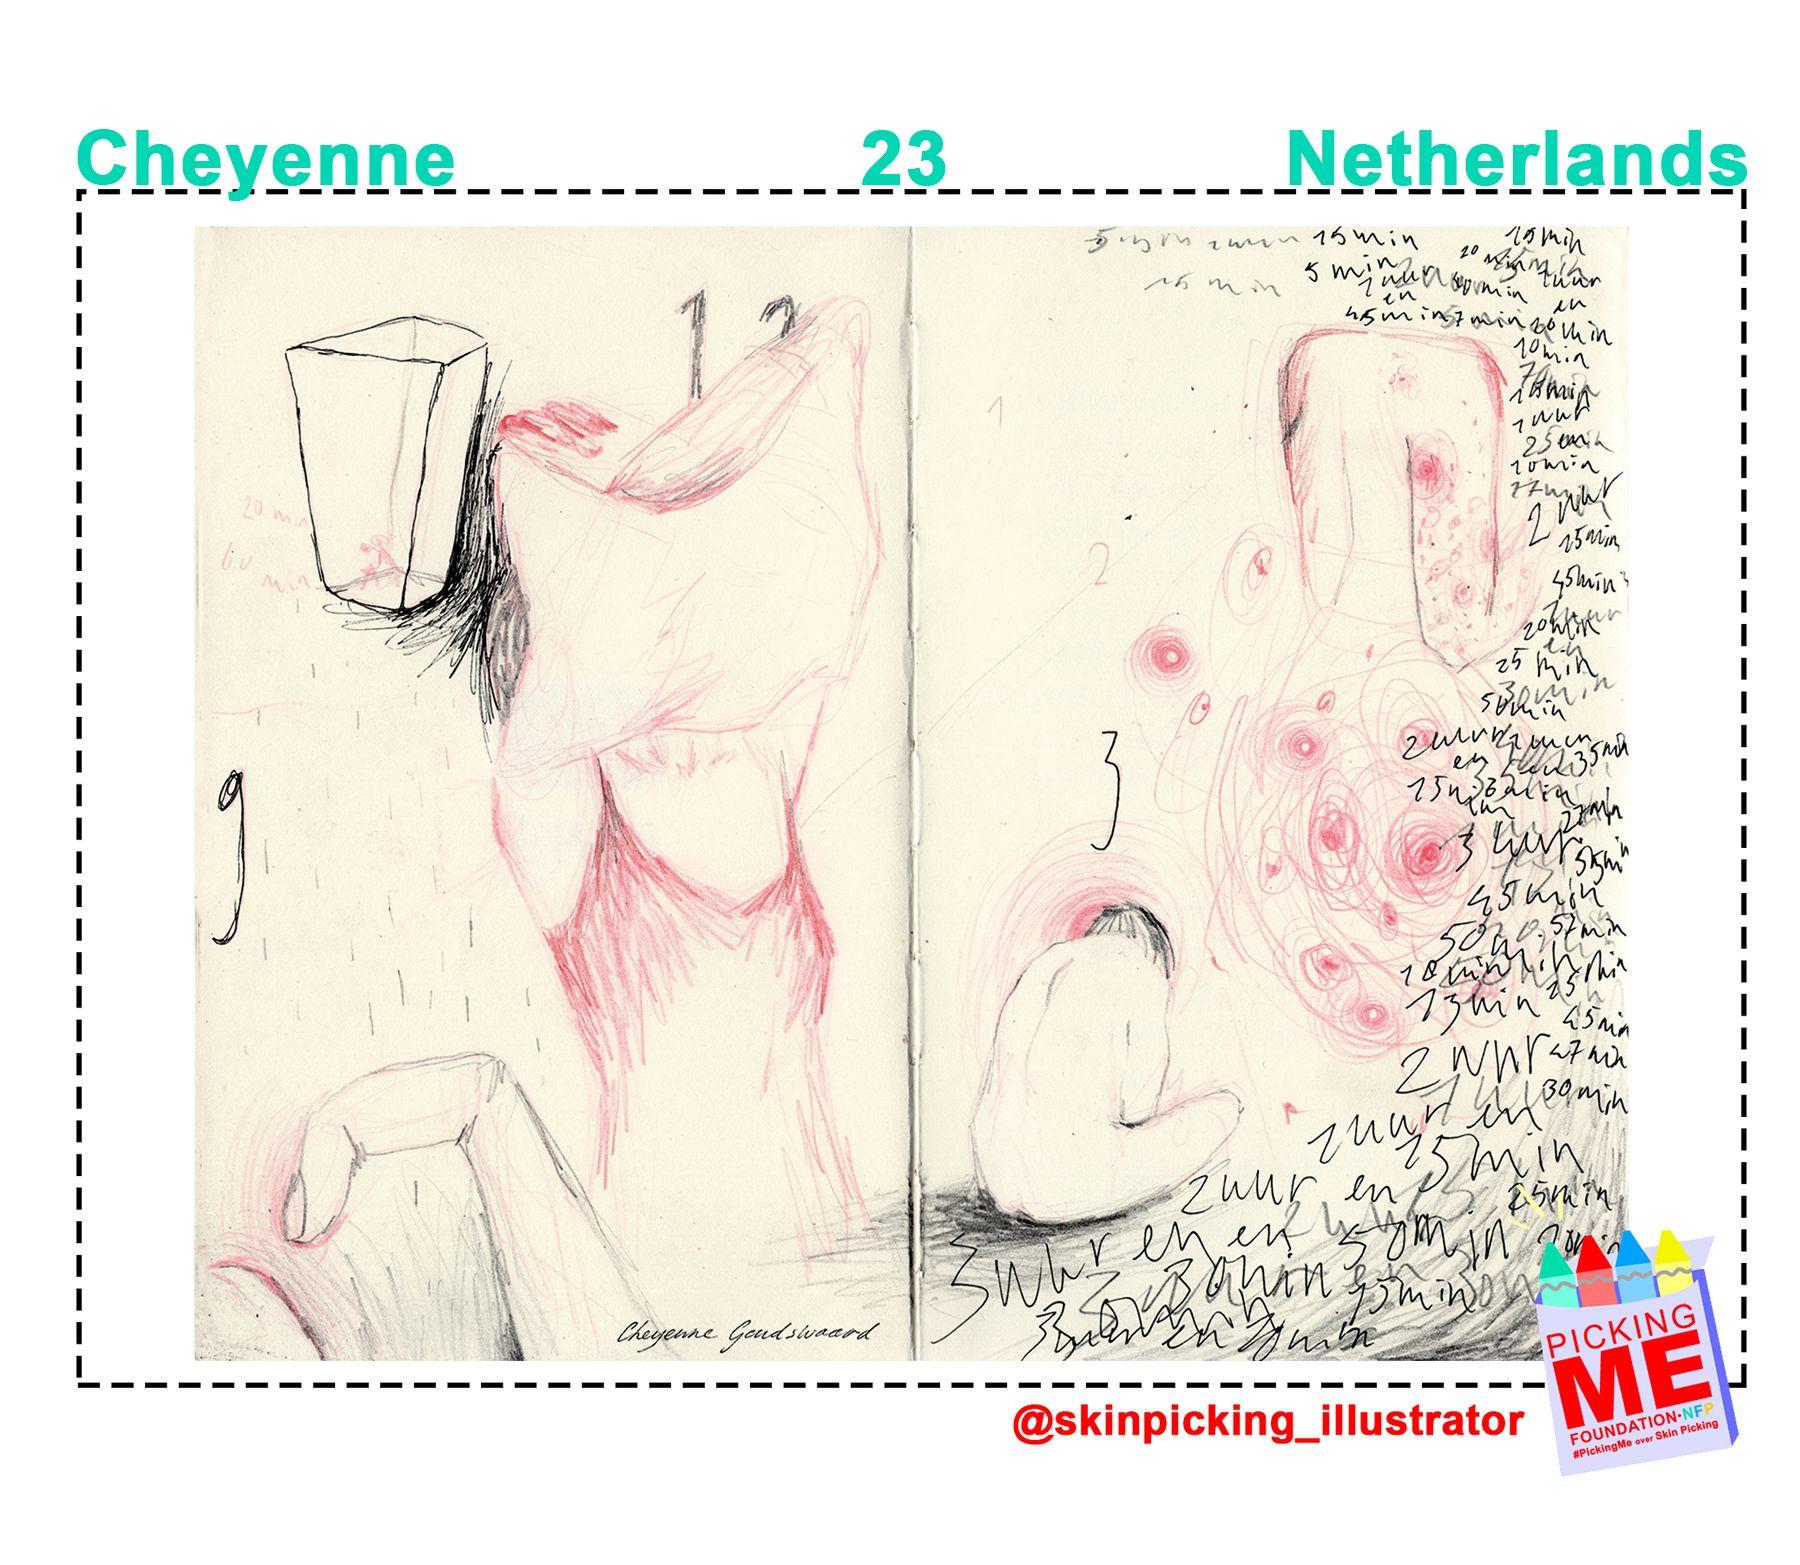 #DrawingWithDerma: Cheyenne